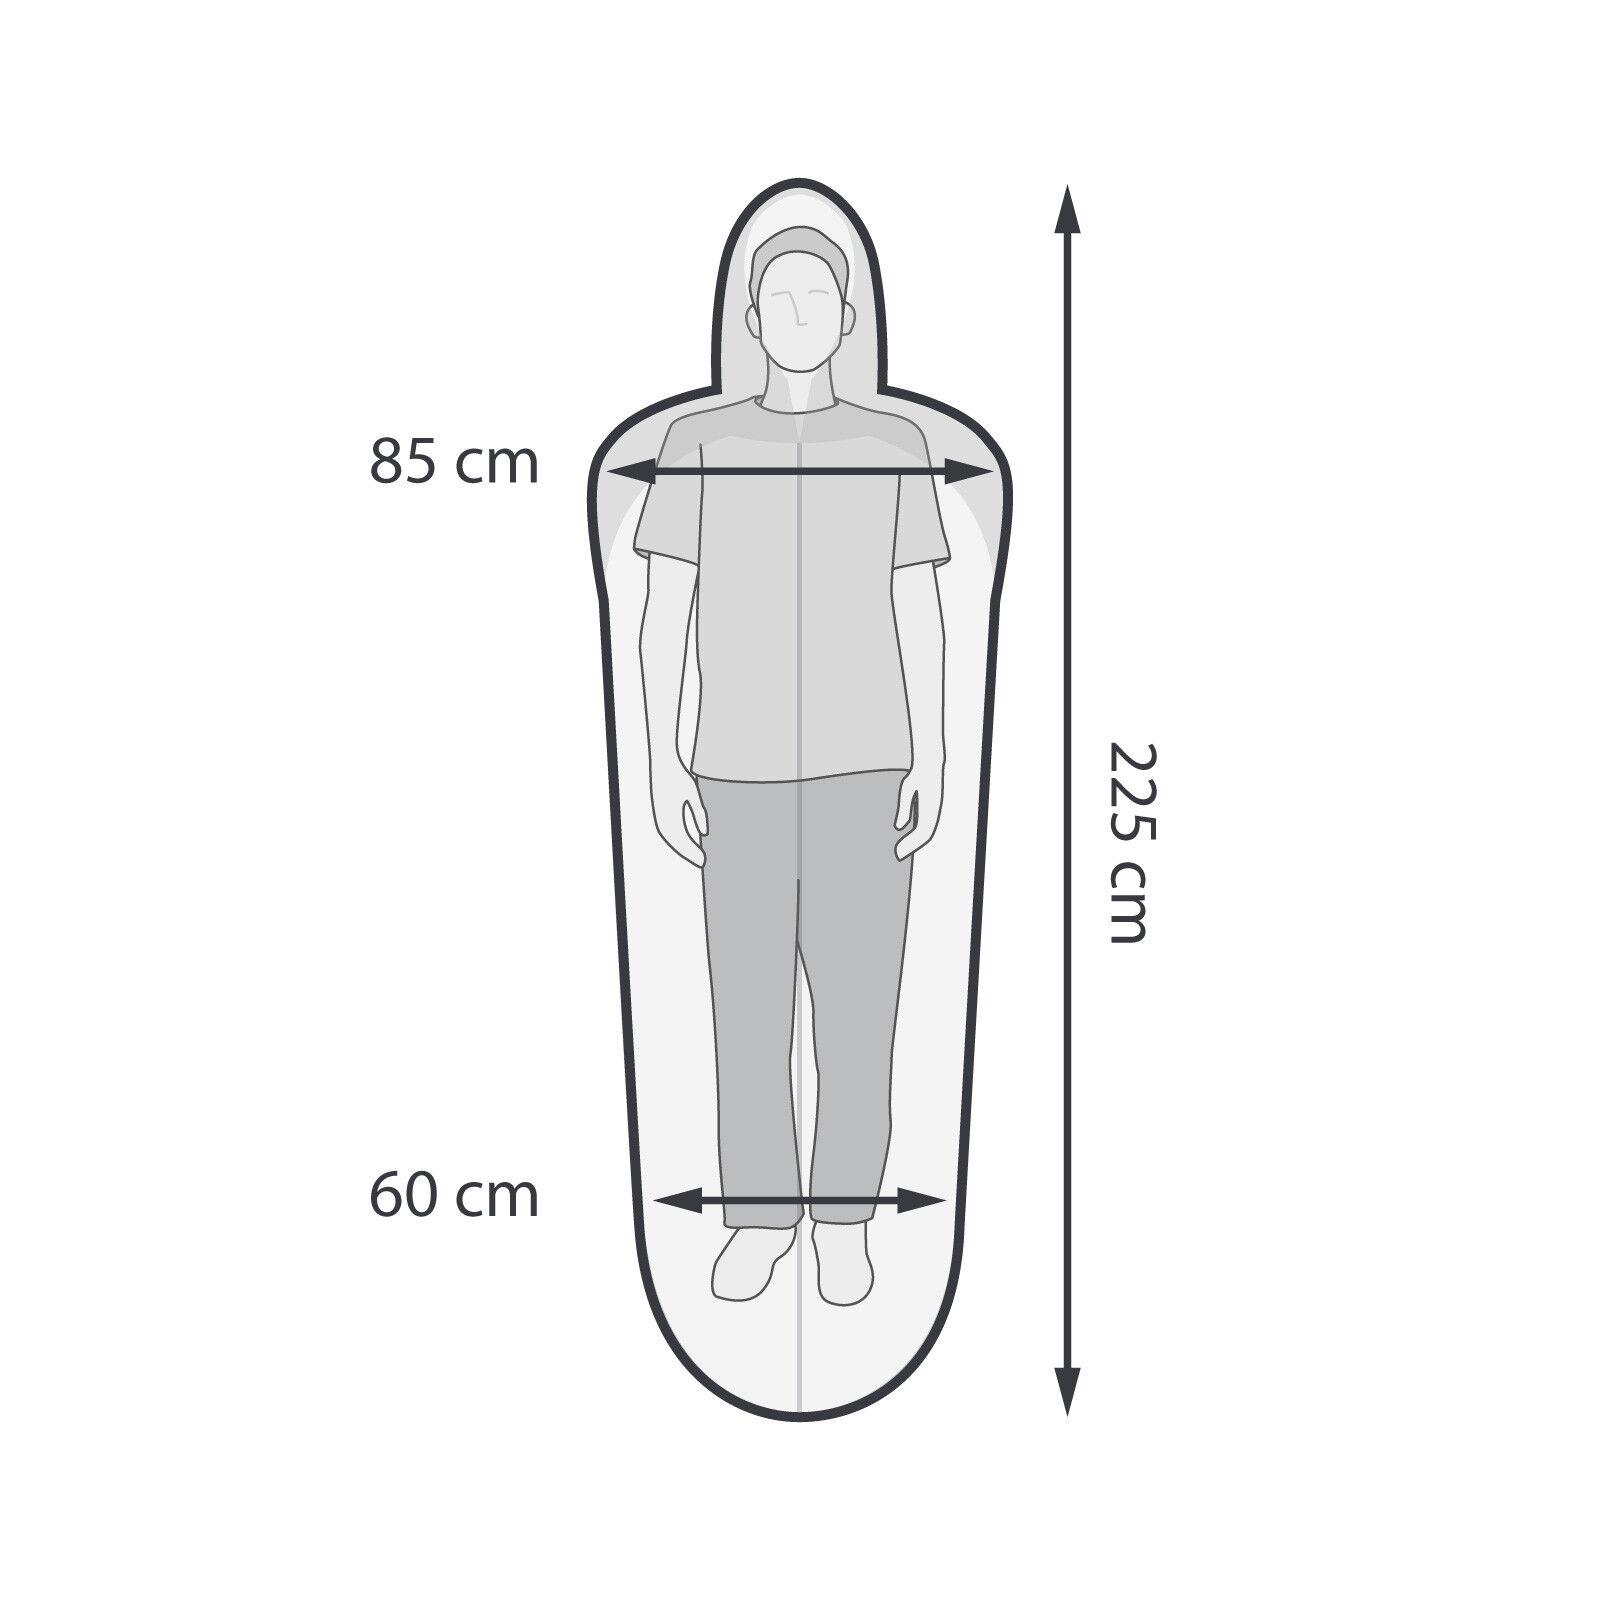 Schlafsack QEEDO Lenny Hüttenschlafsack funktional ultraleicht Inlay Kapuze